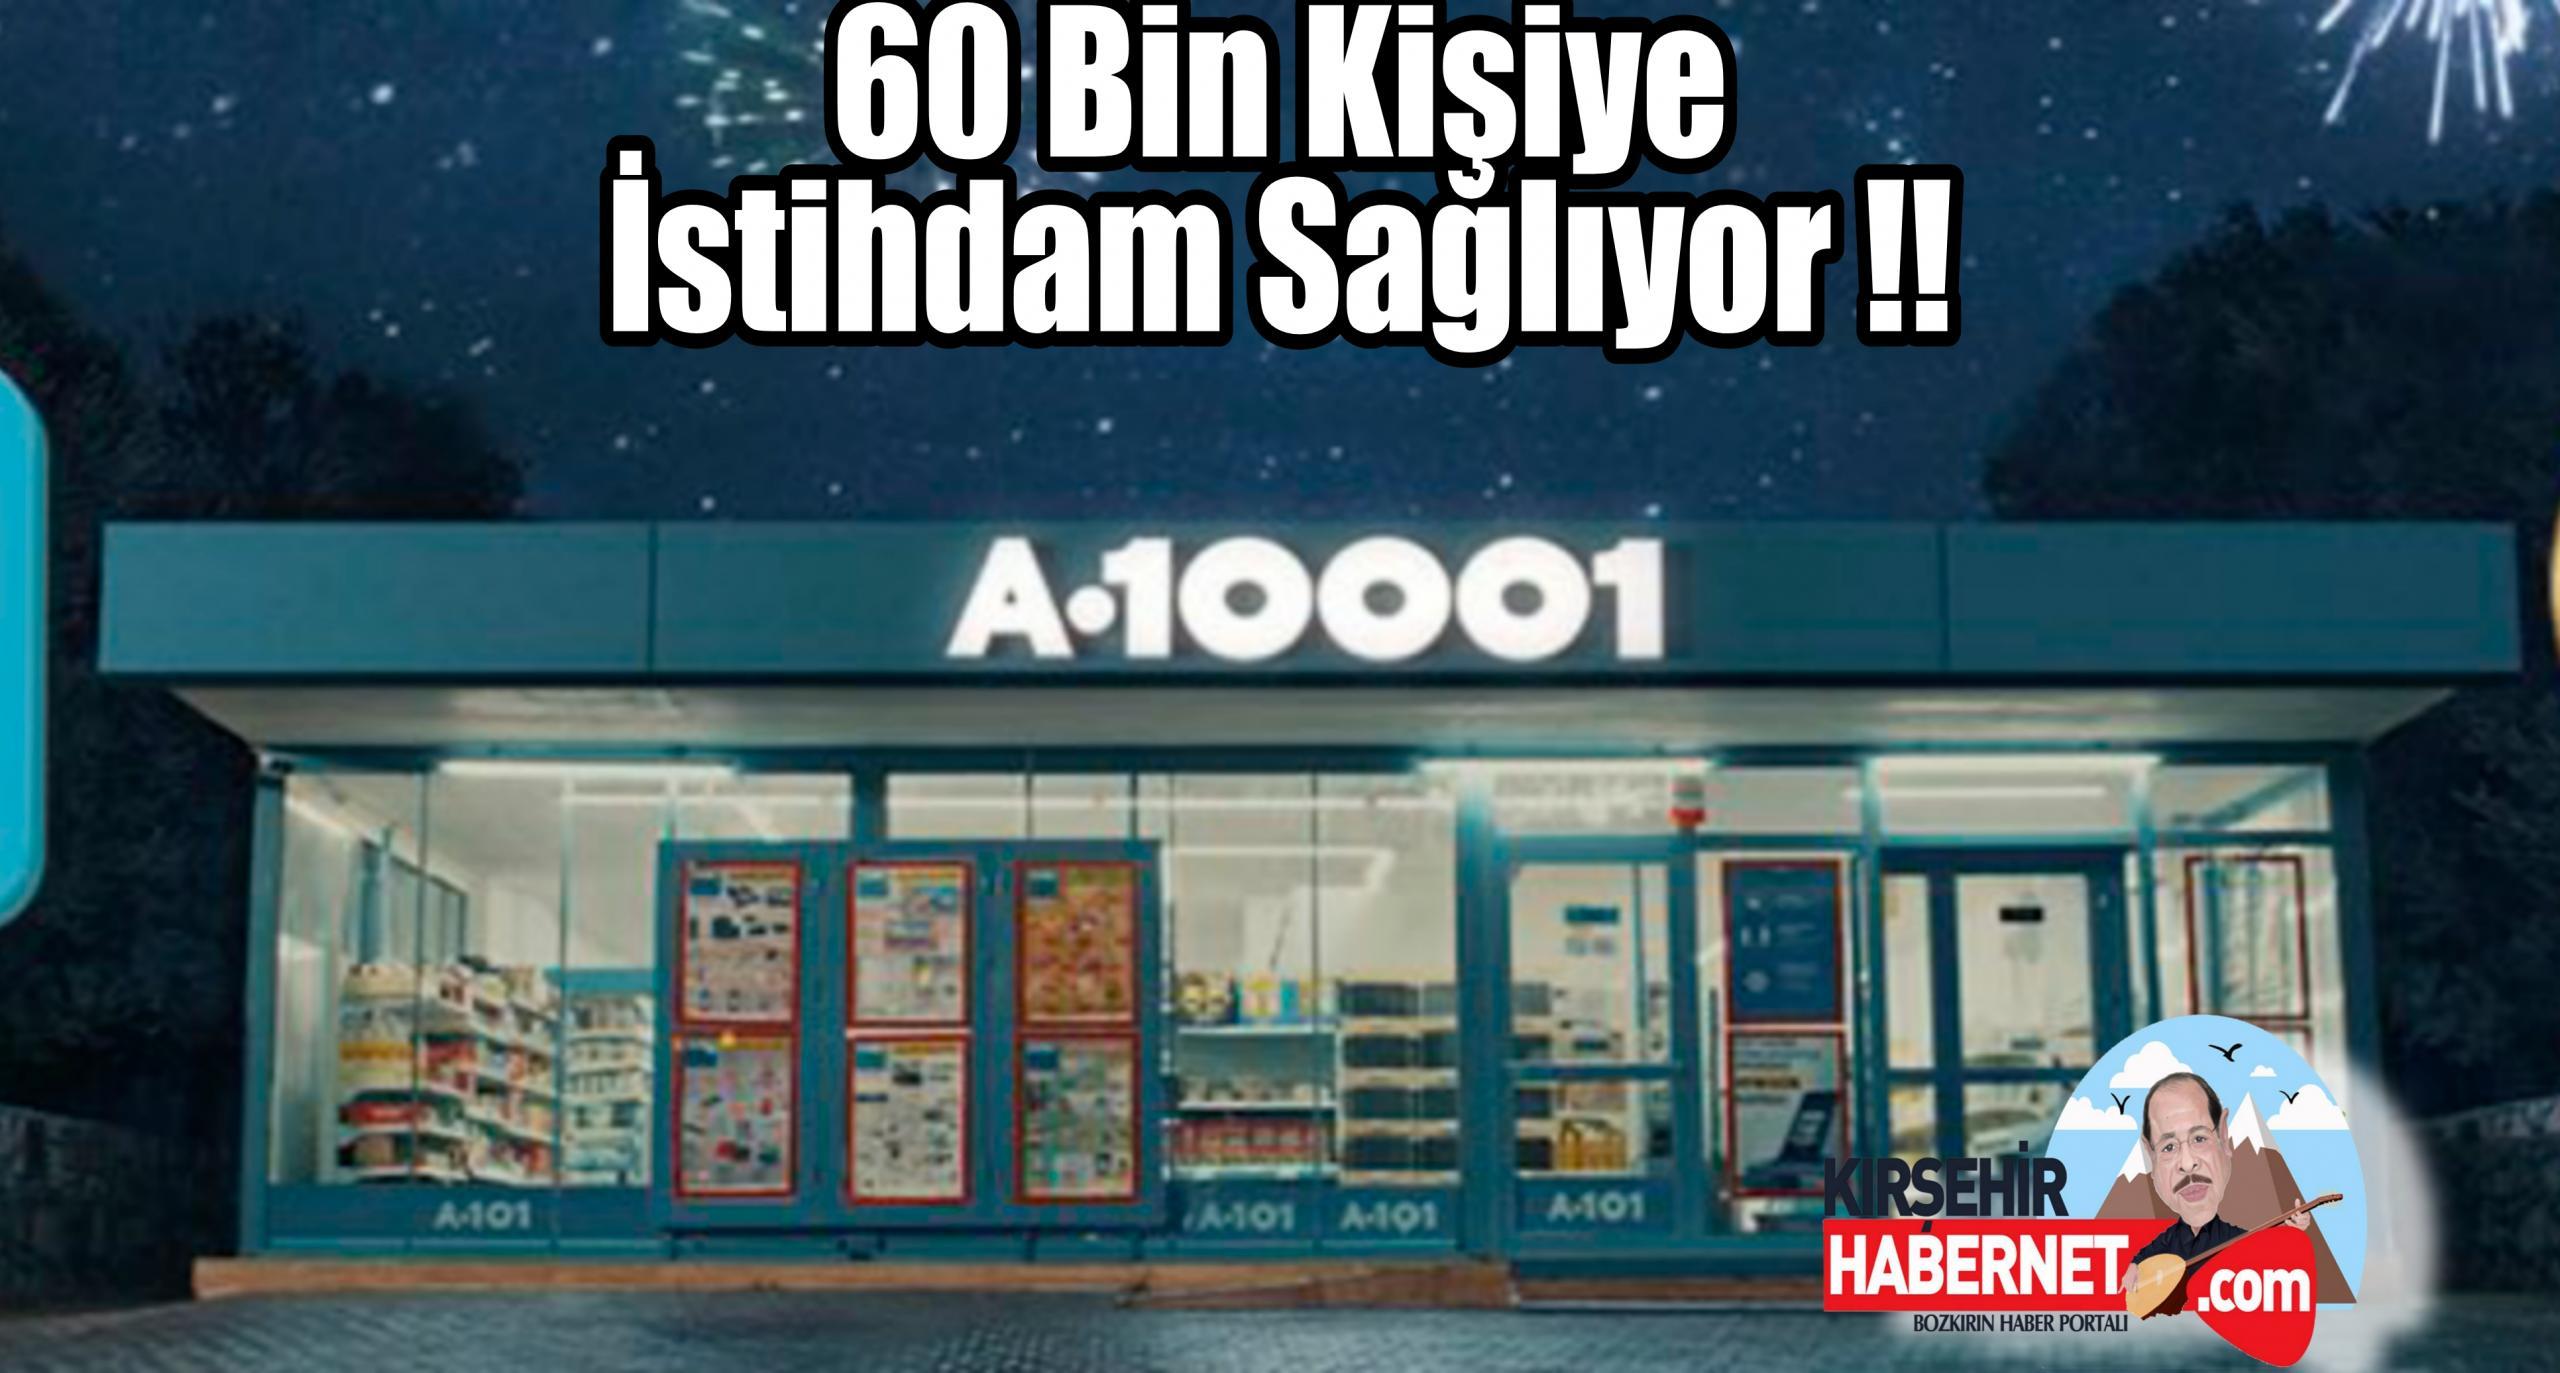 60 BİN KİŞİYE İSTİHDAM !!